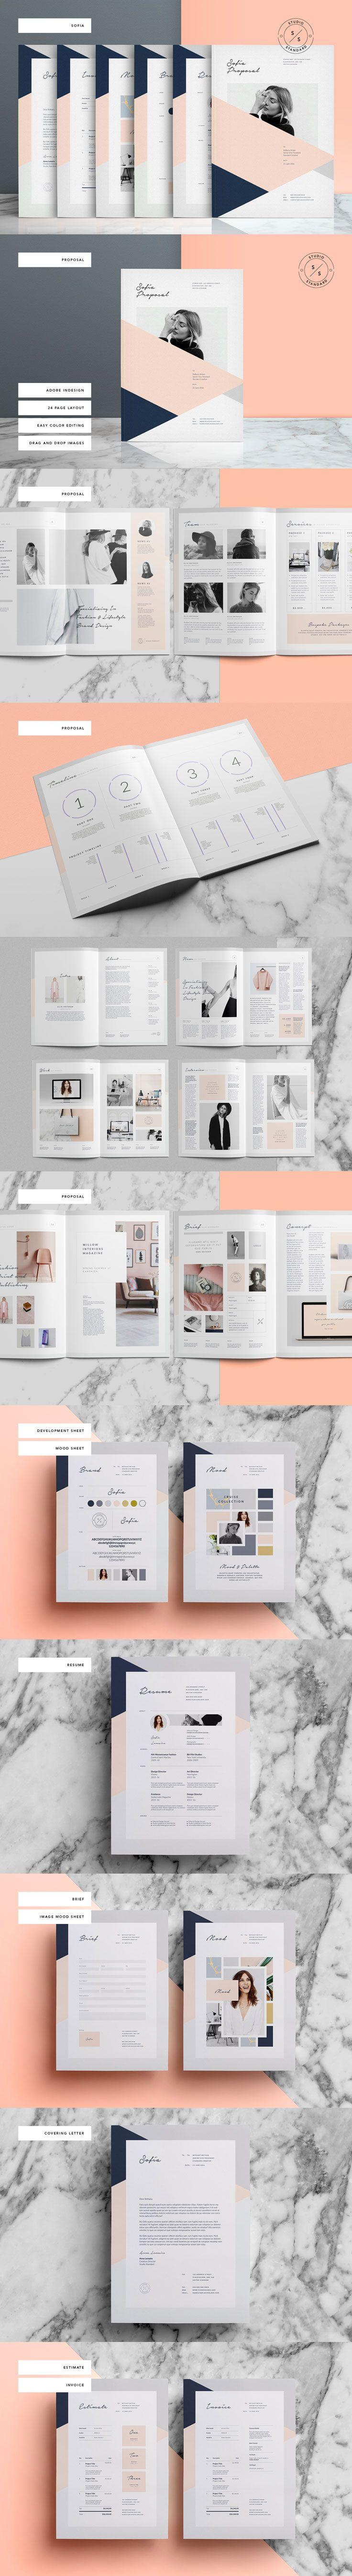 Brochure / Magazine Template on CreativeMarket, A4, A5 (Tech Design)